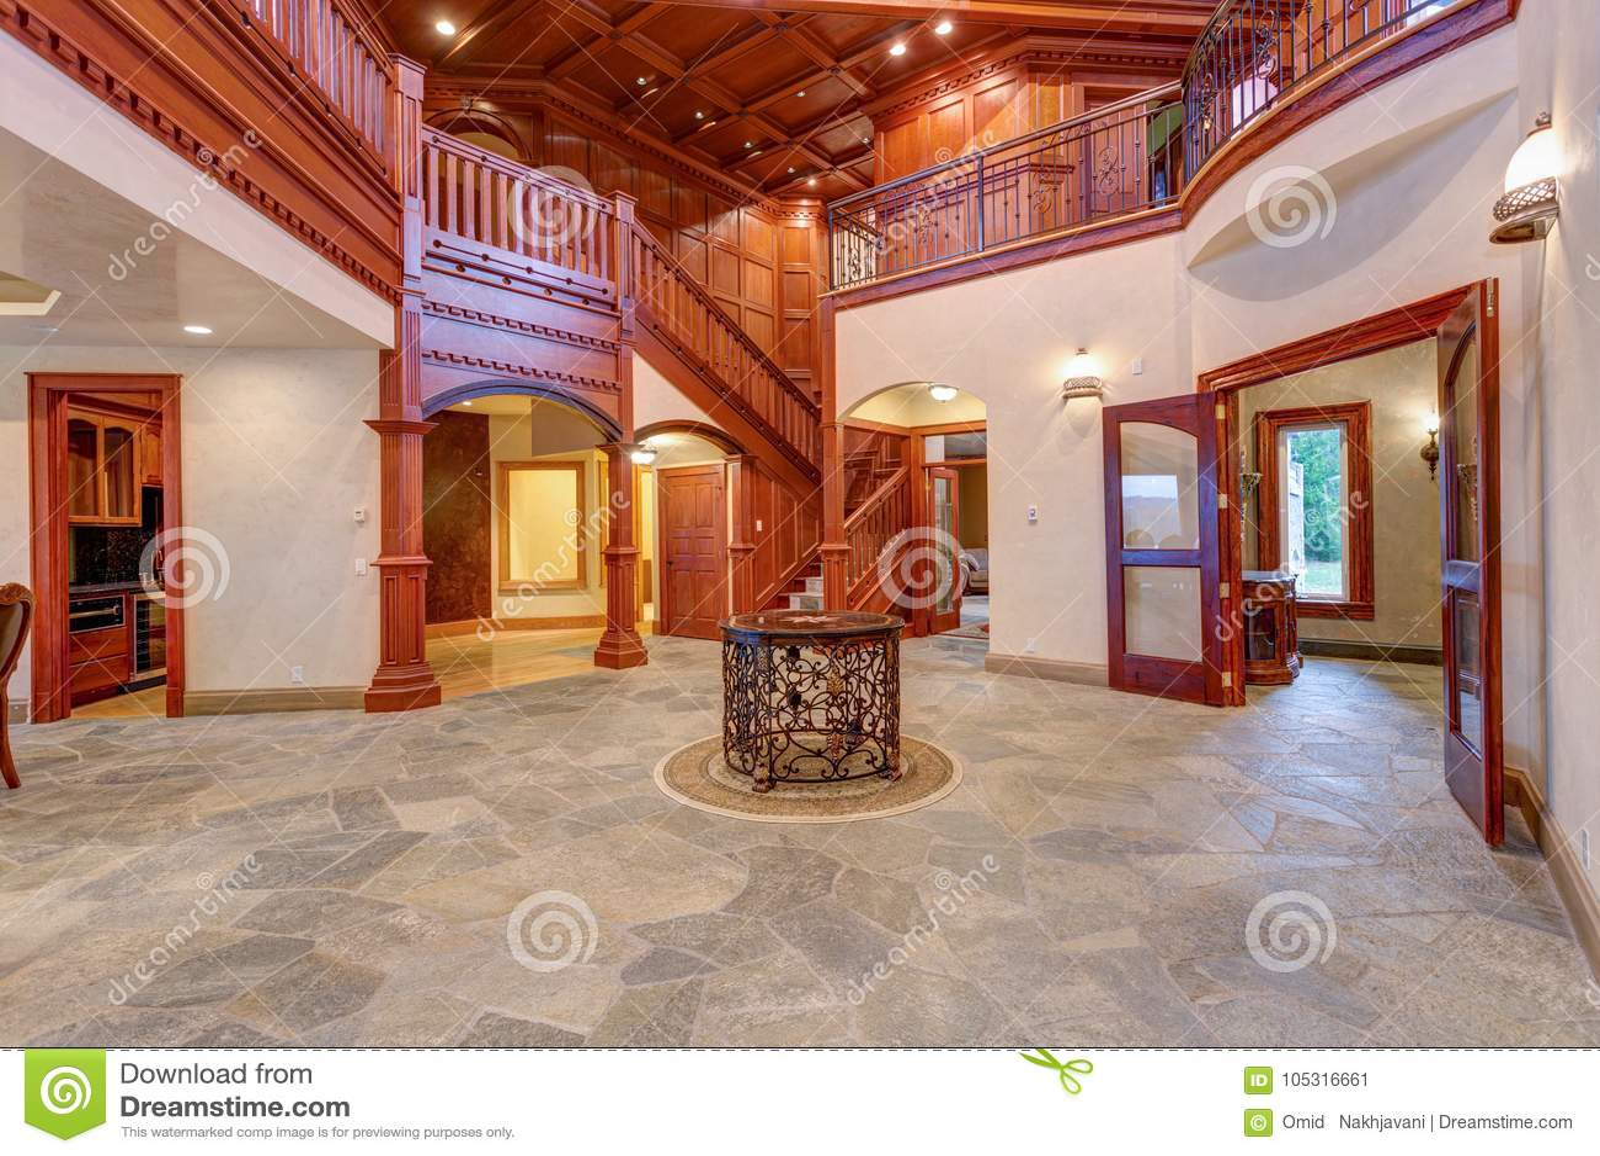 Stunning Wedding Venue Hall With Wood Paneled Walls Stock Image